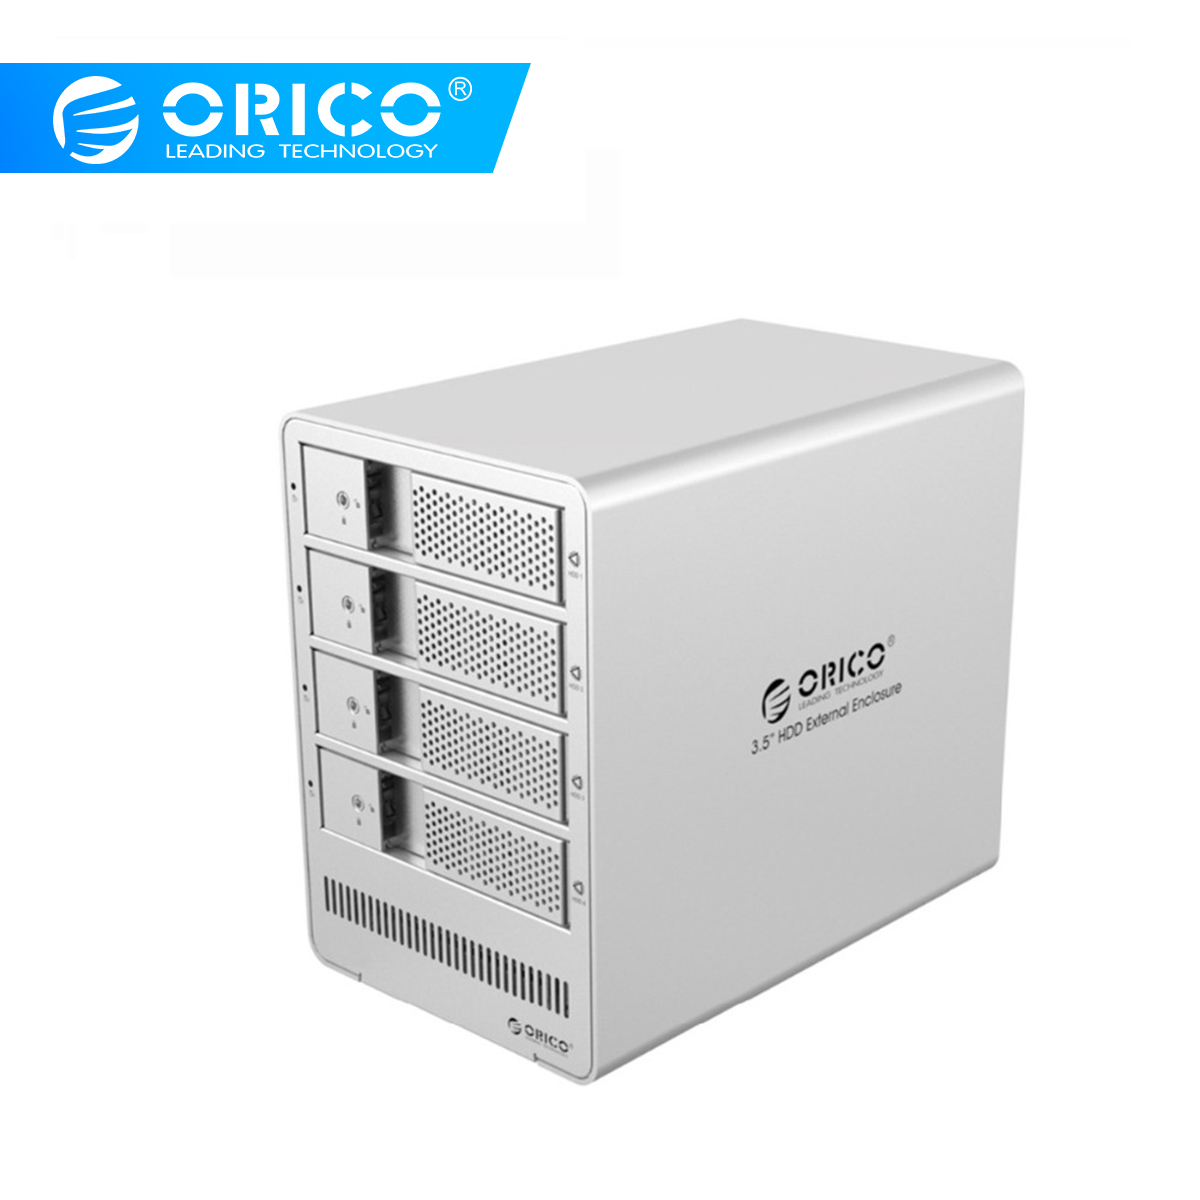 ORICO Tool Free 4 Bay 3,5